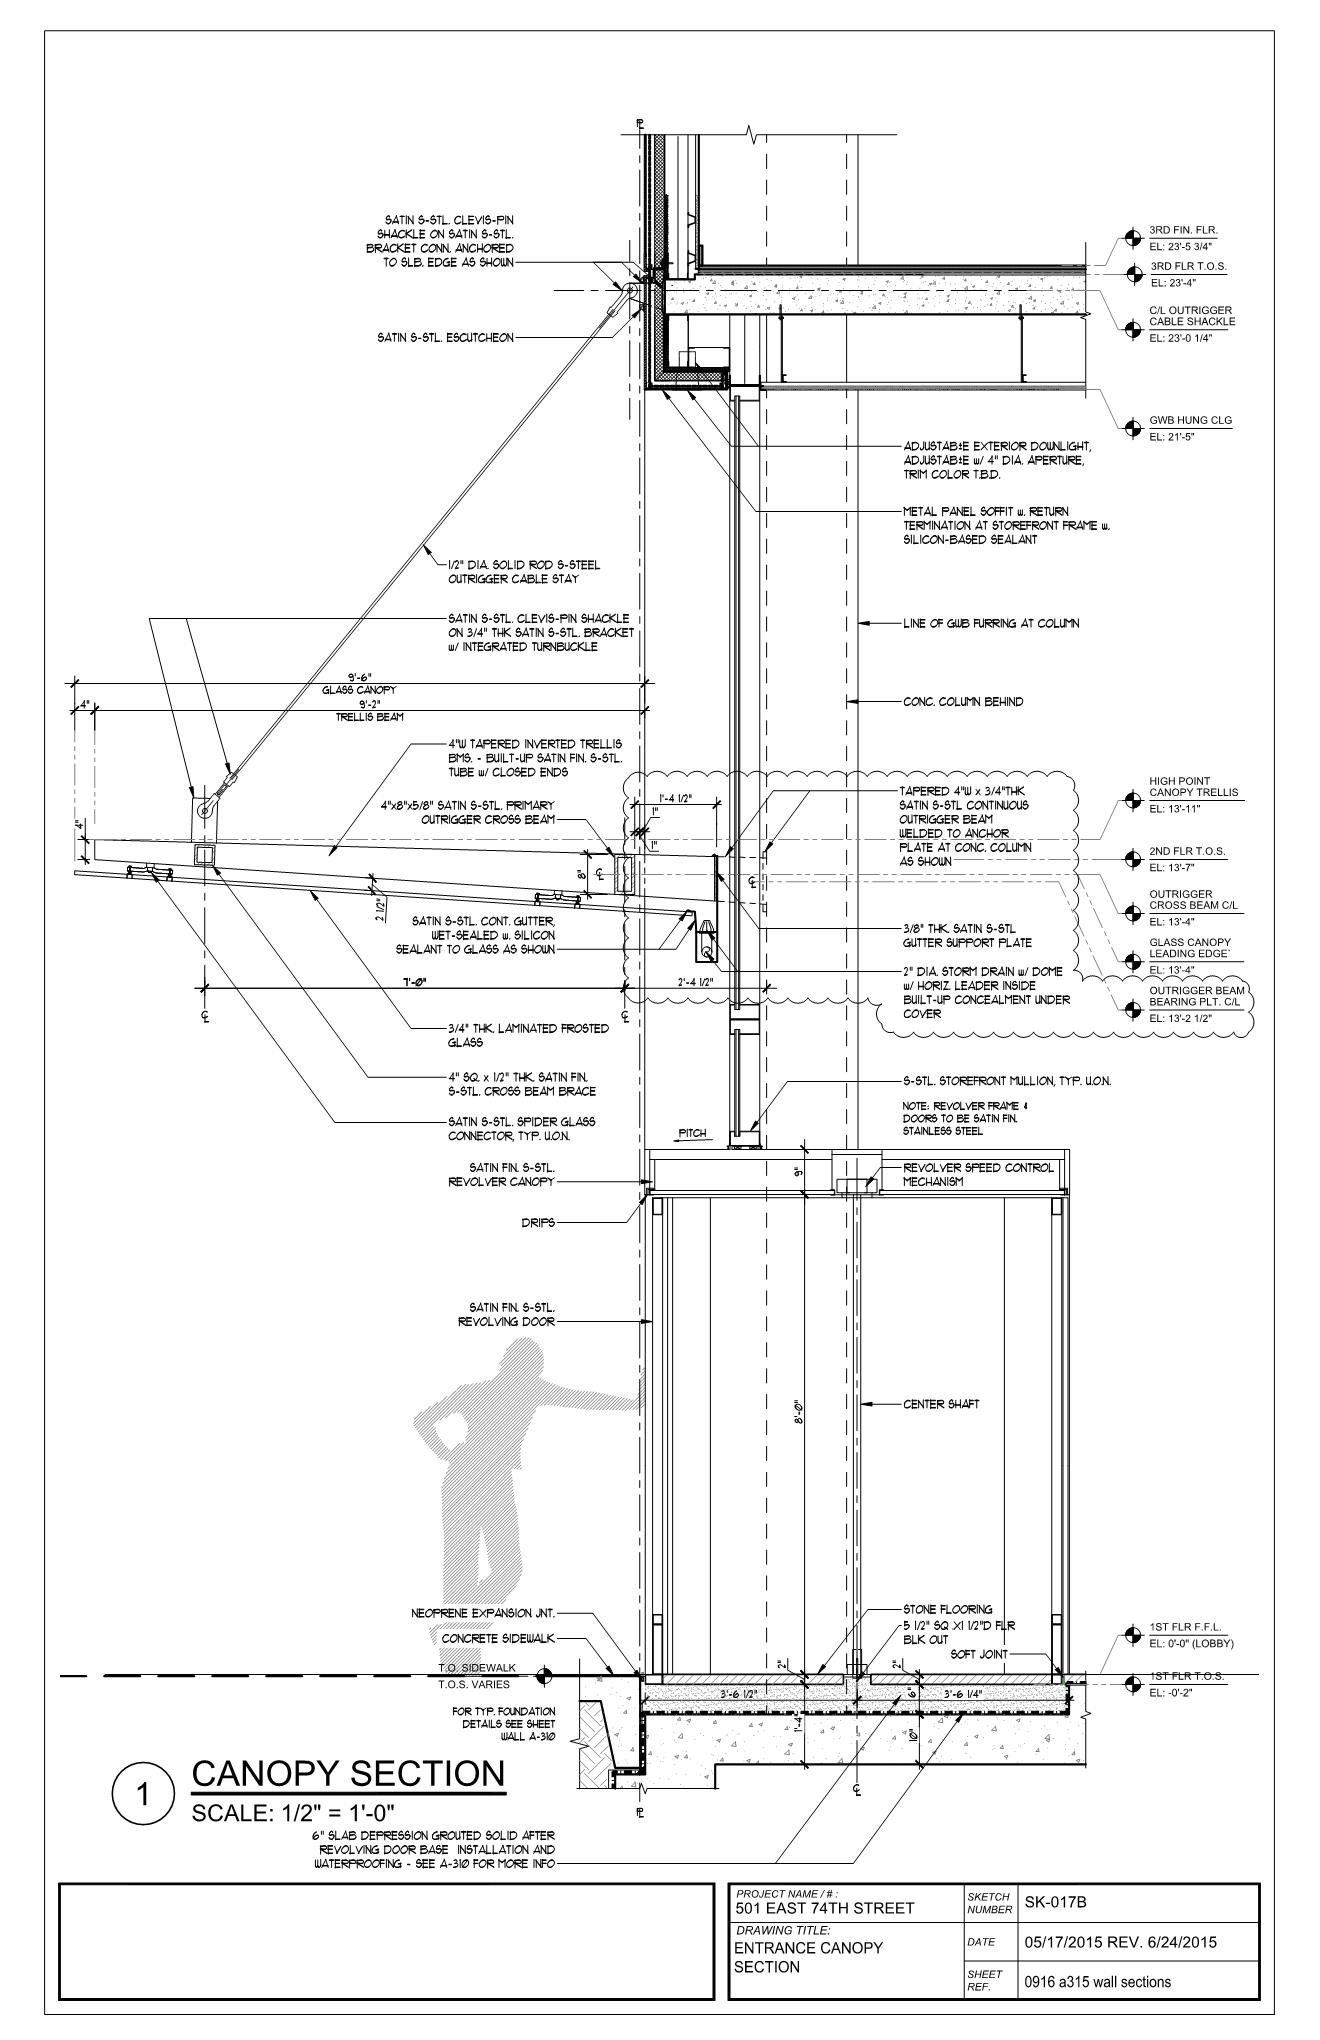 501 East 74th Street Manhattan TET SHIN TS YONG Archinect